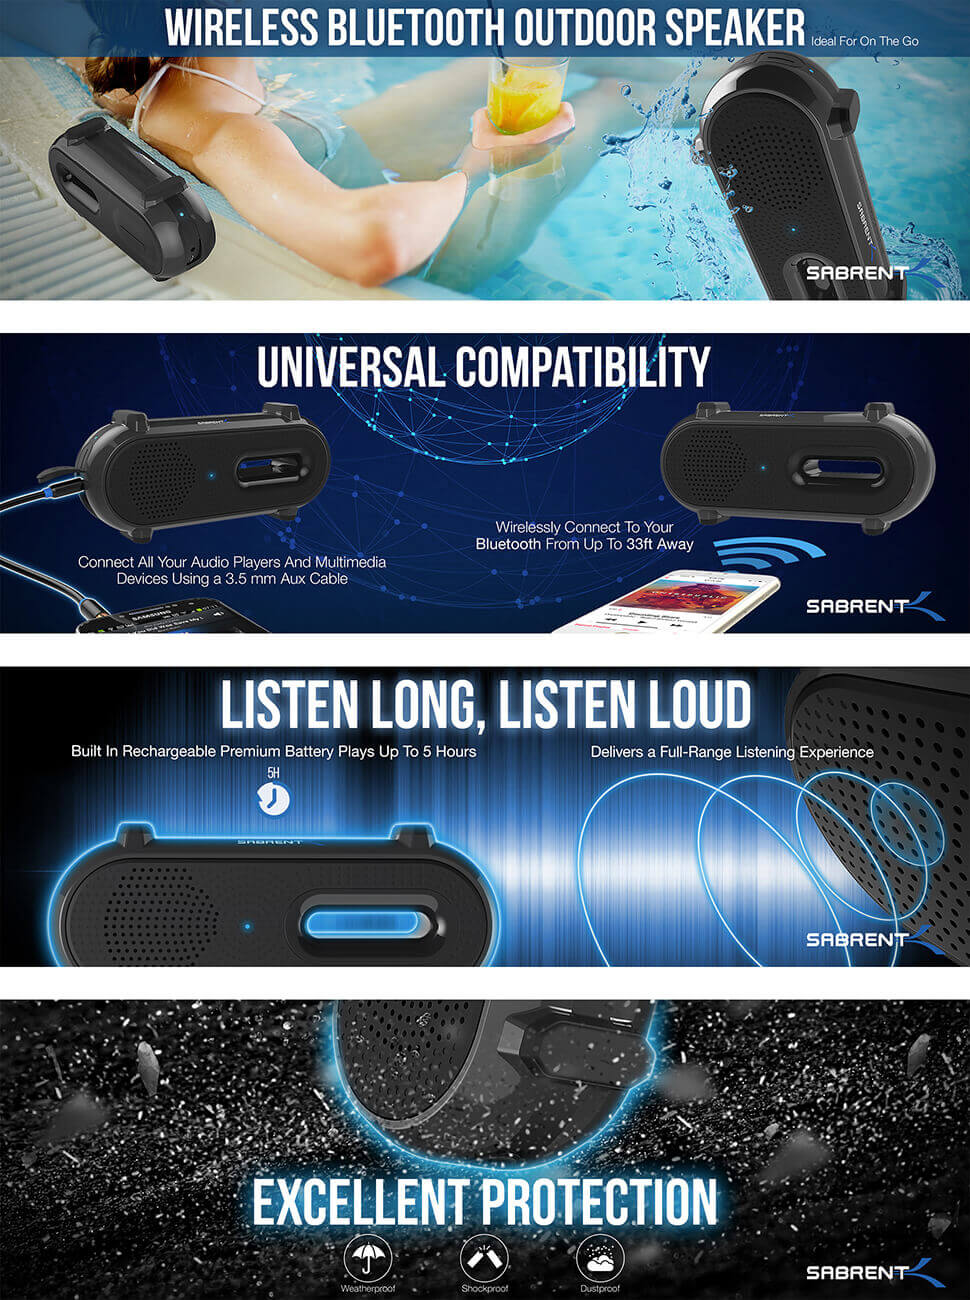 Sabrent Ultra-Portable Weatherproof Wireless Bluetooth Speaker for Outdoor//Indoor 10 Hours Rechargeable Battery SP-BYTA